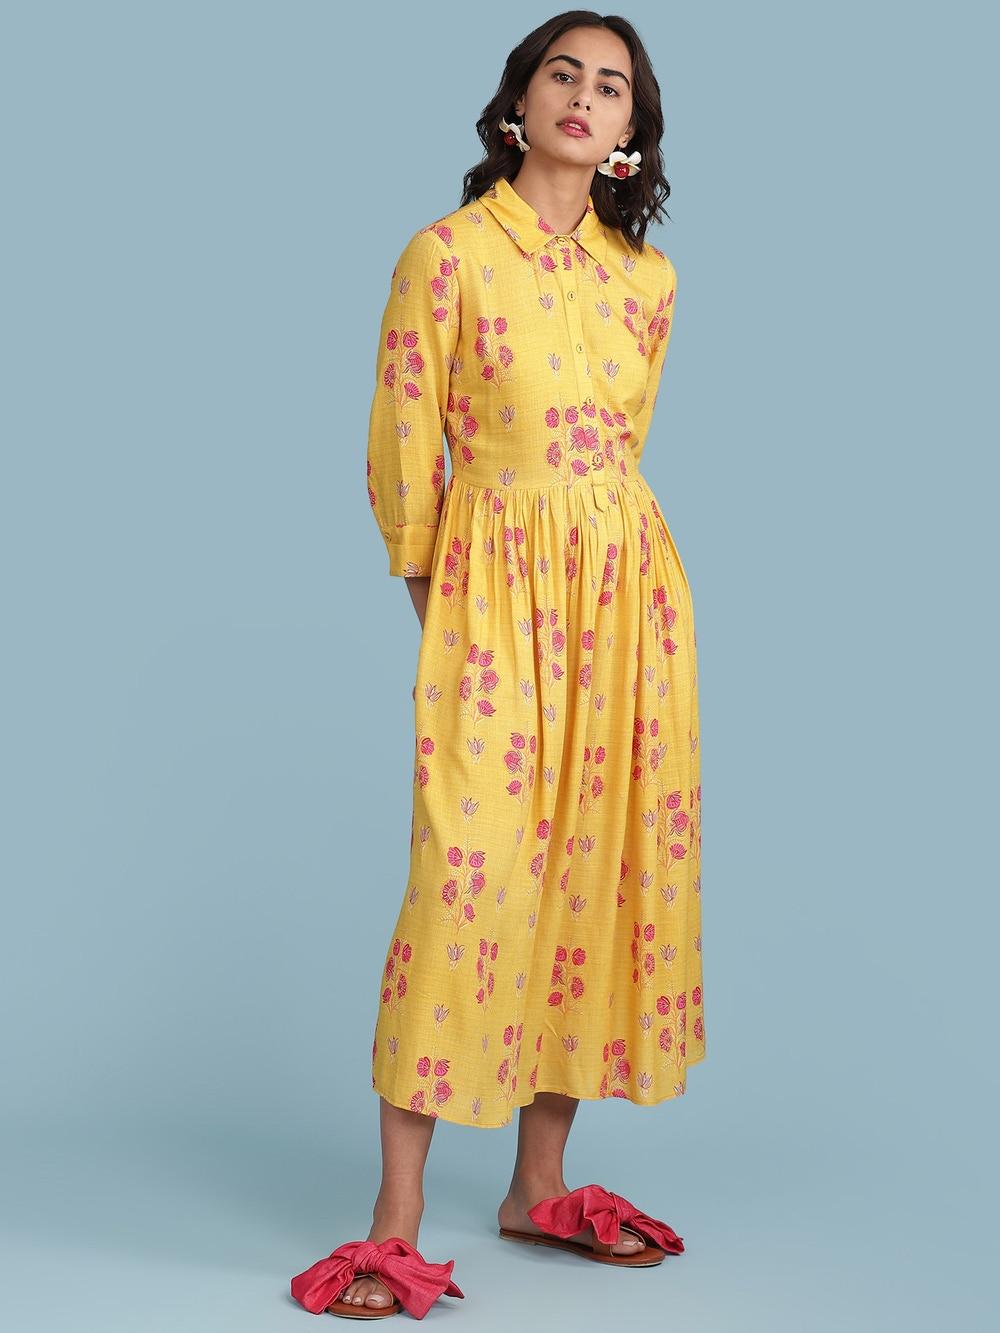 Yellow Floral Print Shirt Dress